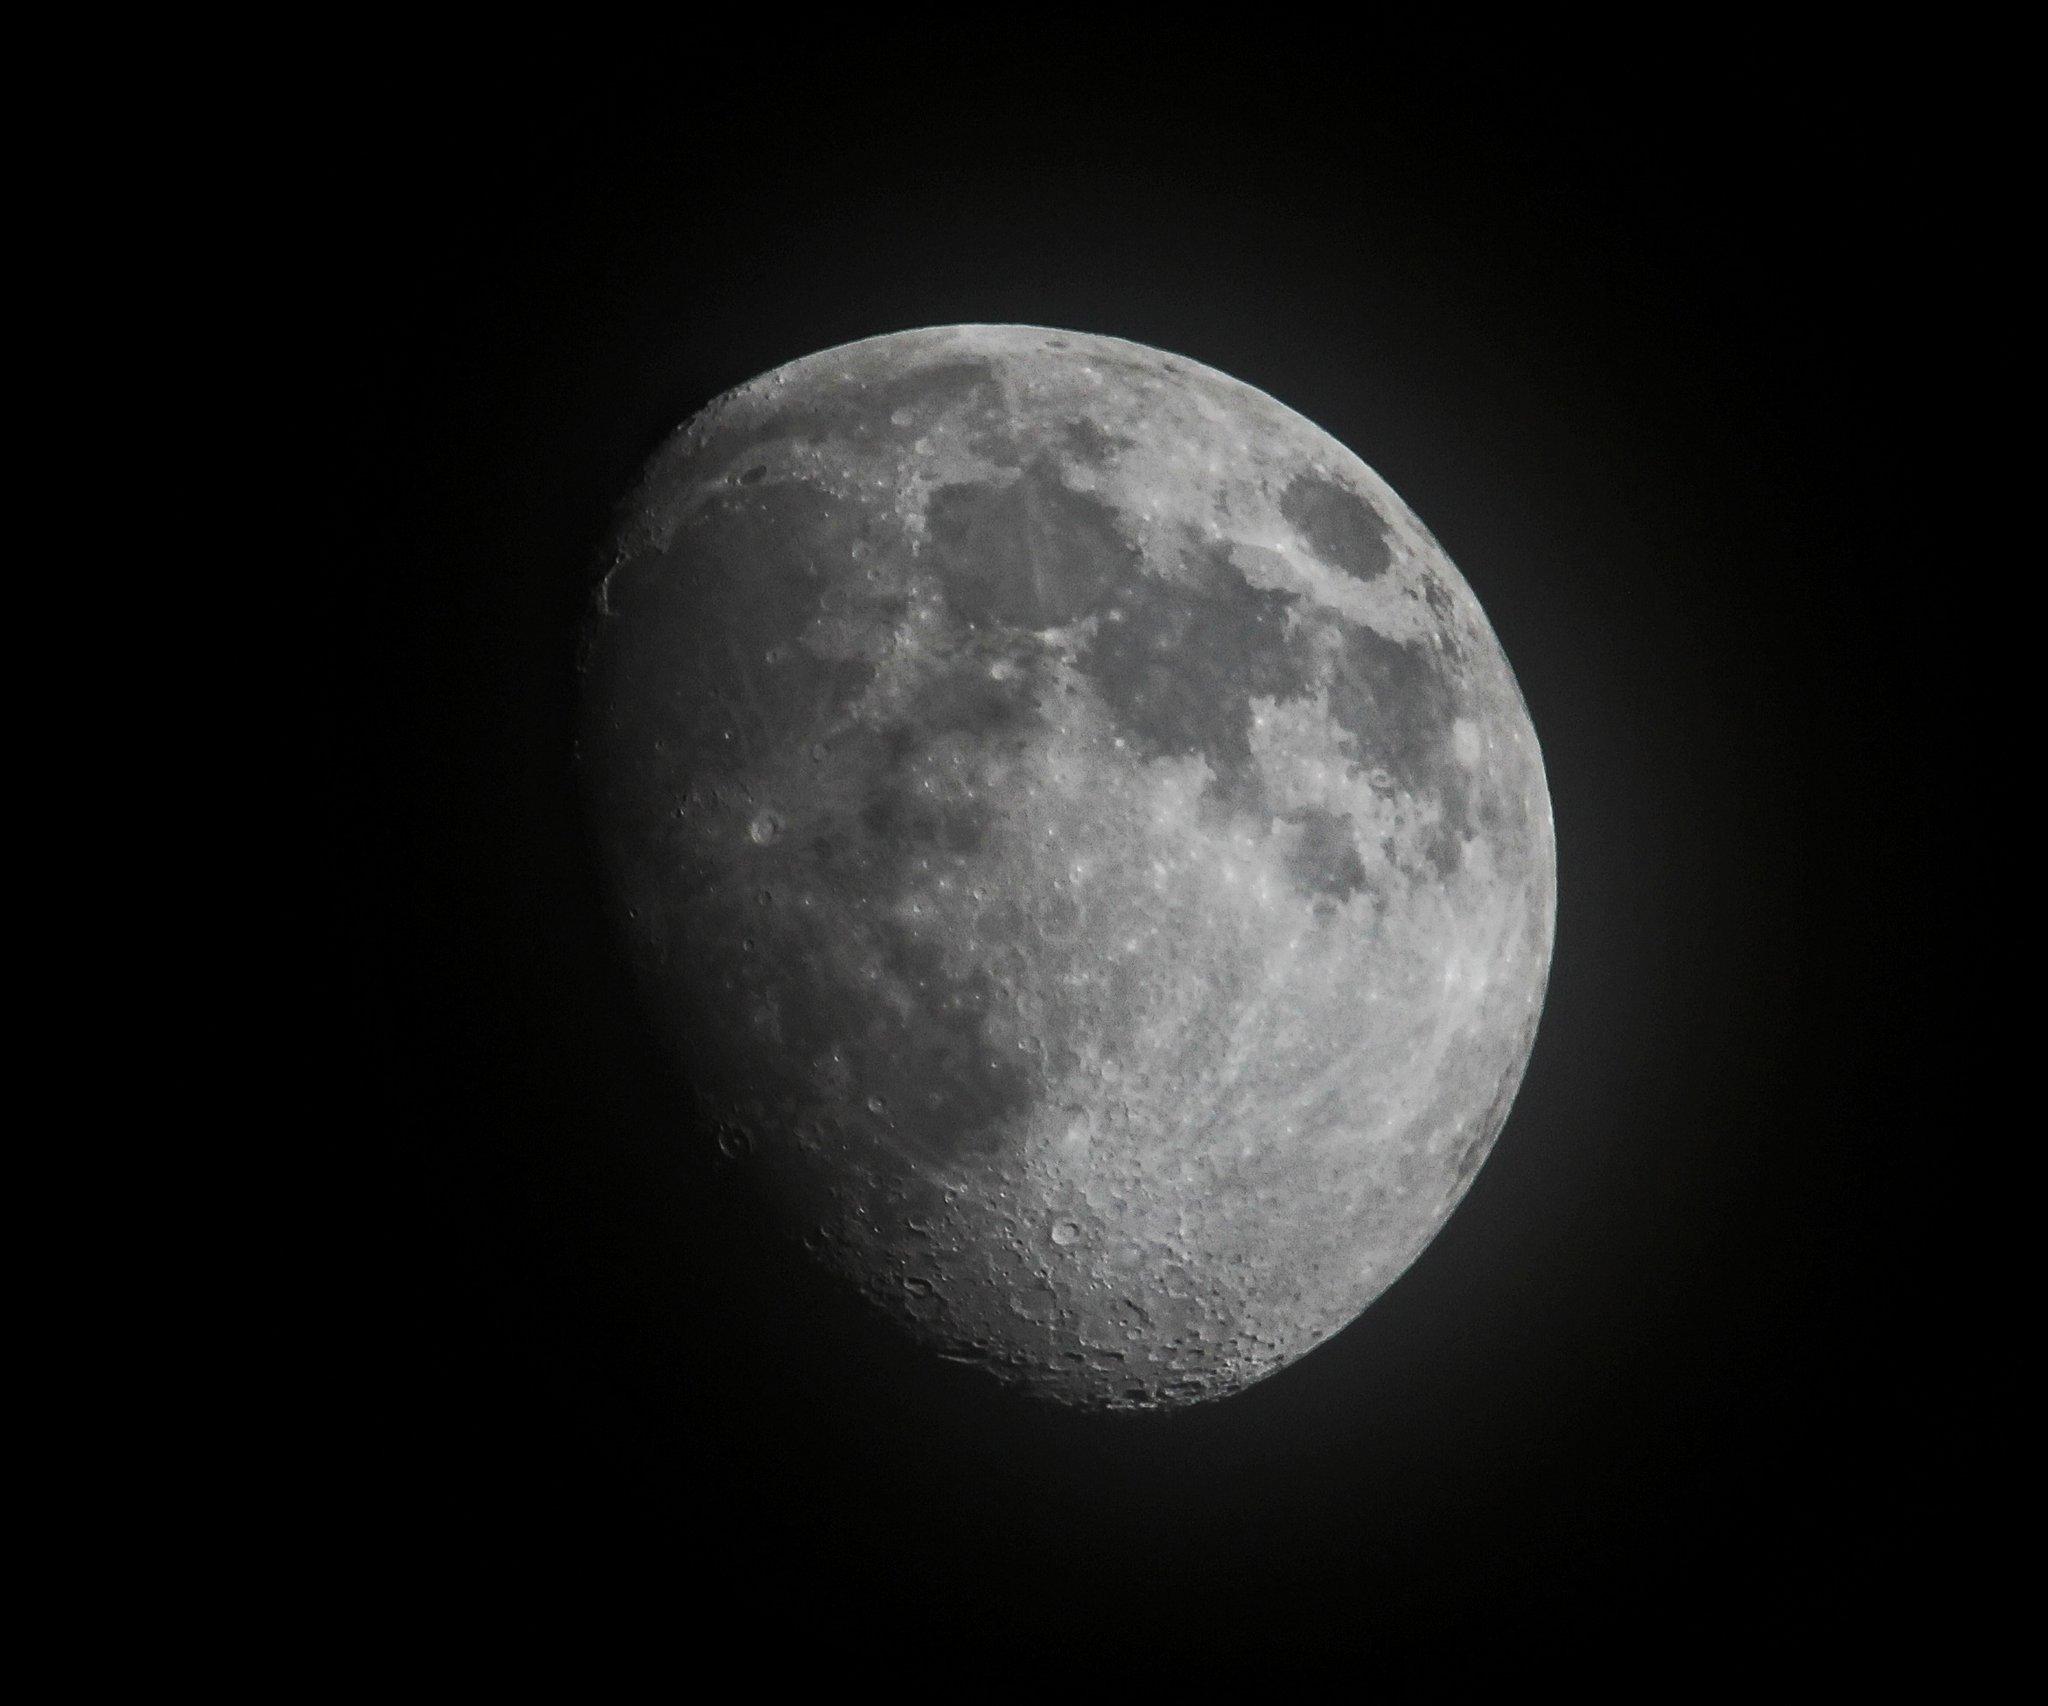 Moon tonight through some haze https://t.co/MHX9NENKfG